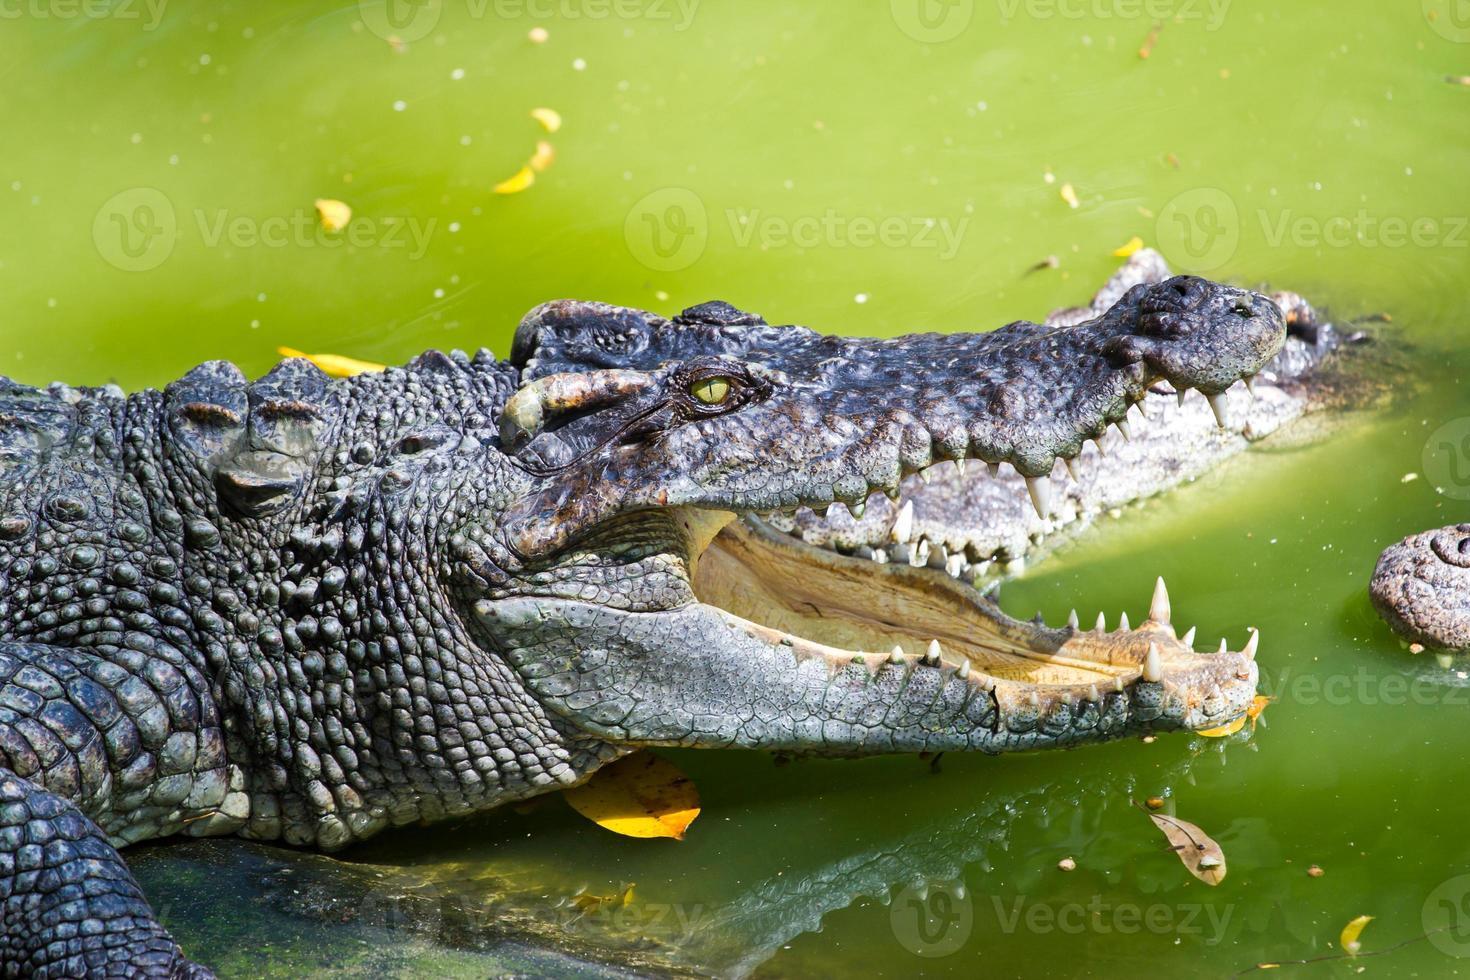 boca aberta de crocodilo de vida selvagem, isolada no fundo branco foto